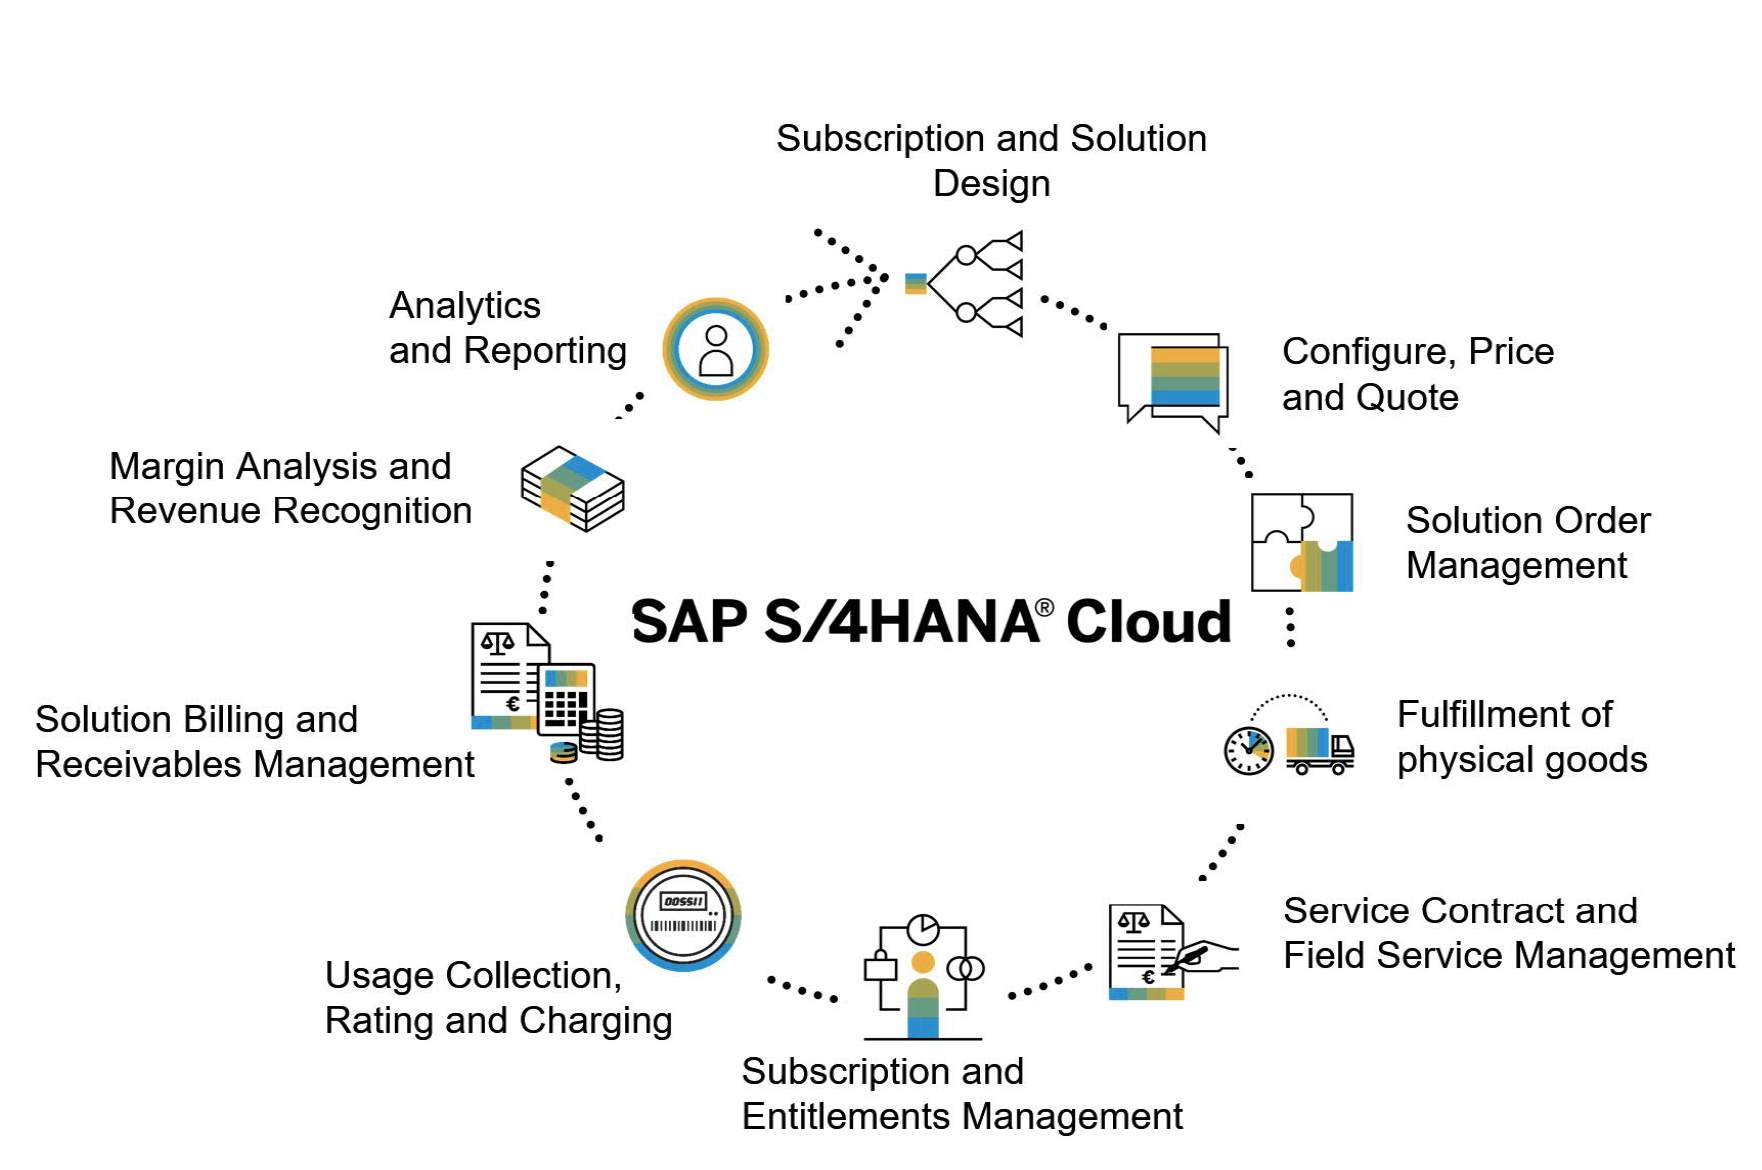 Subscription Business Model with SAP S/4HANA Cloud